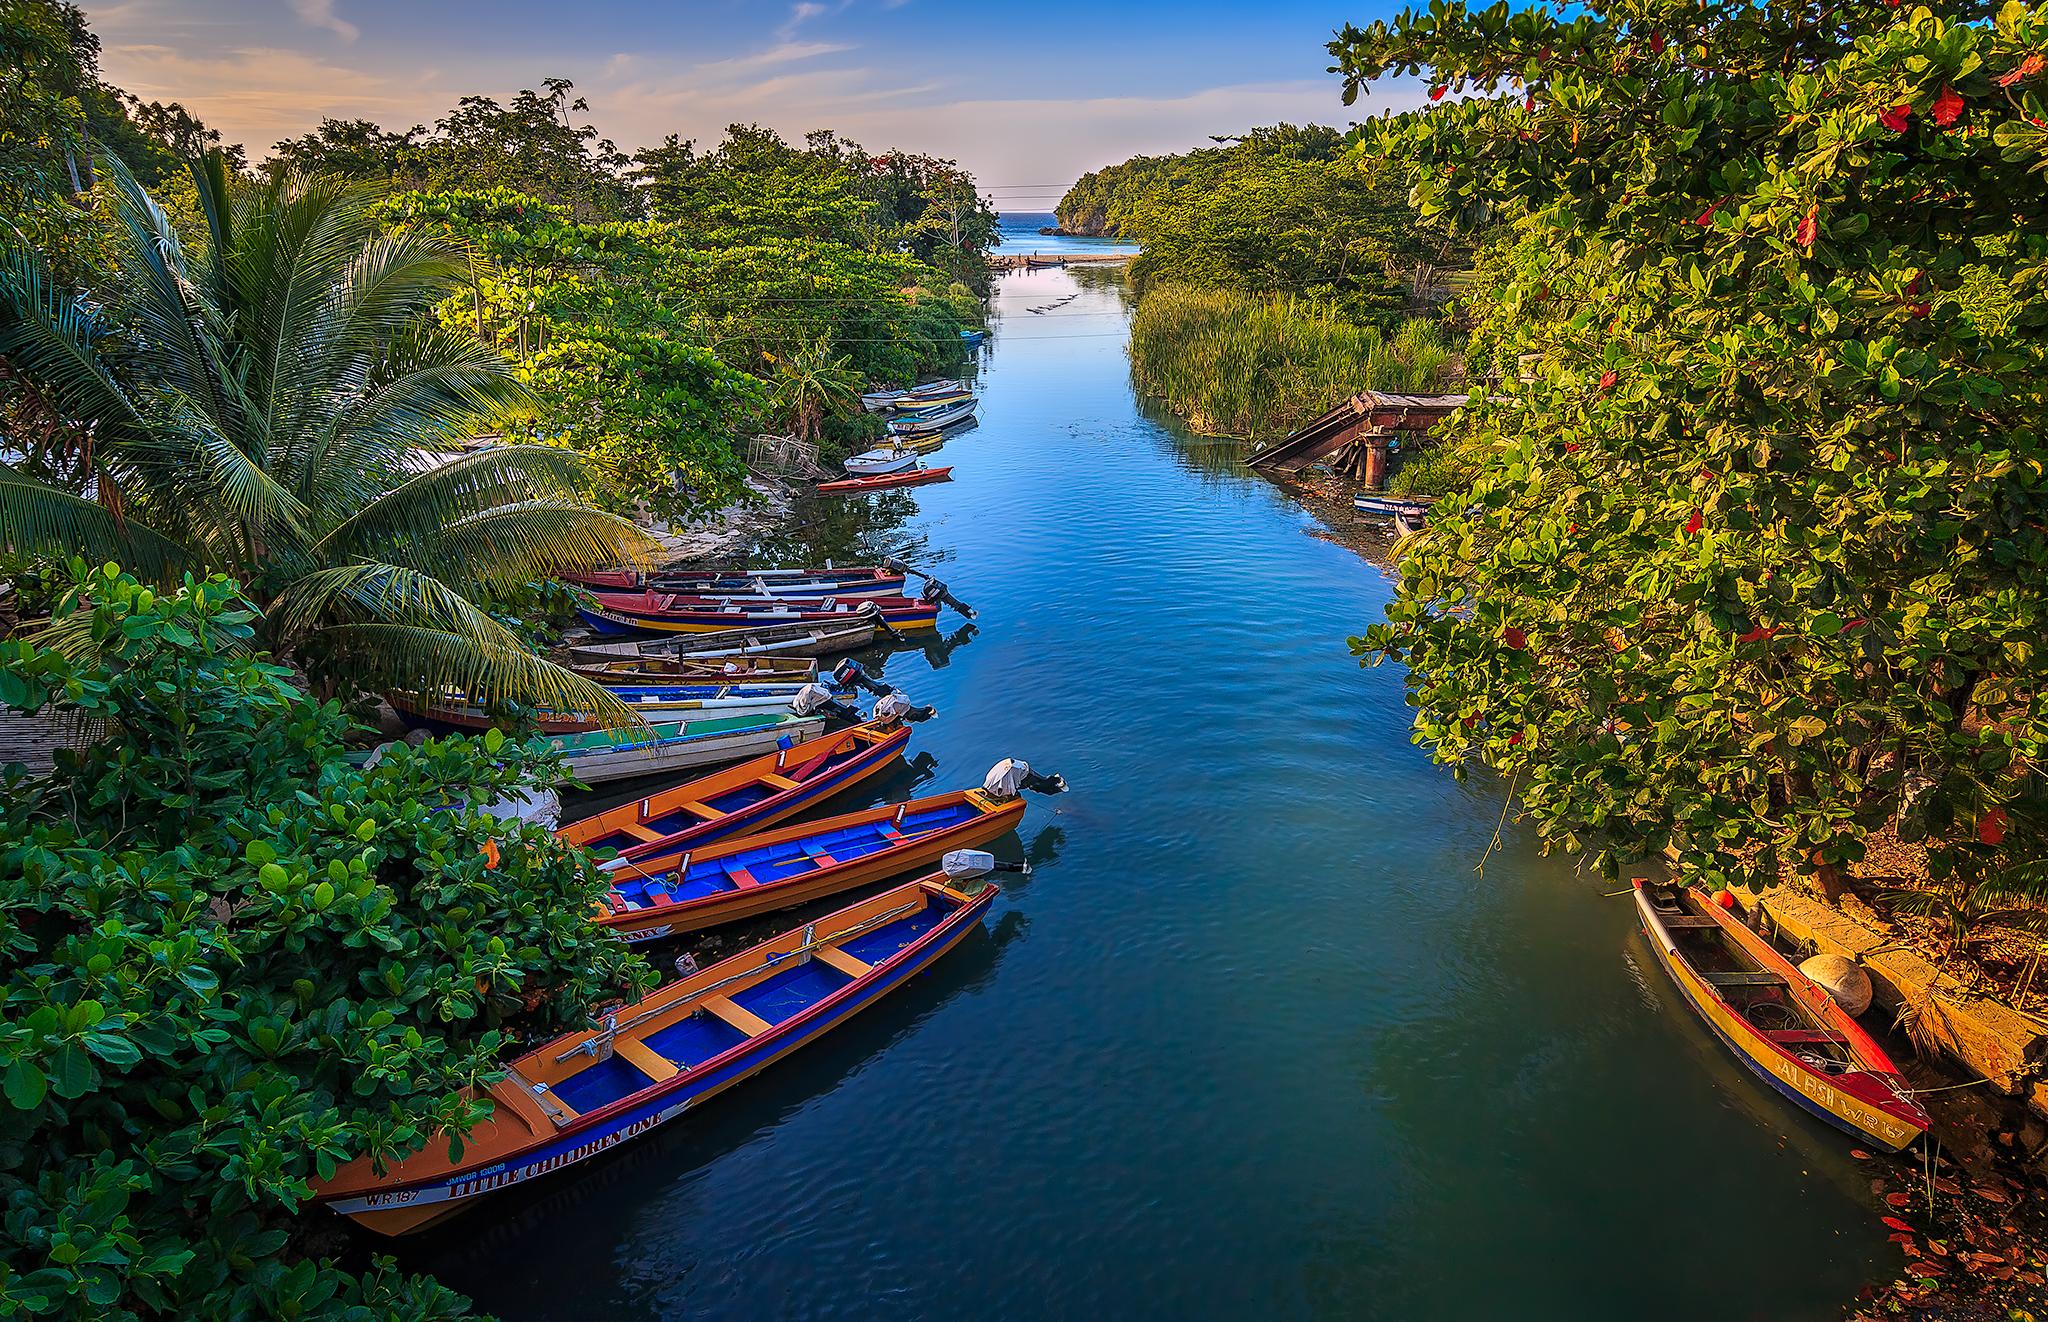 The White River in St Ann, Jamaica